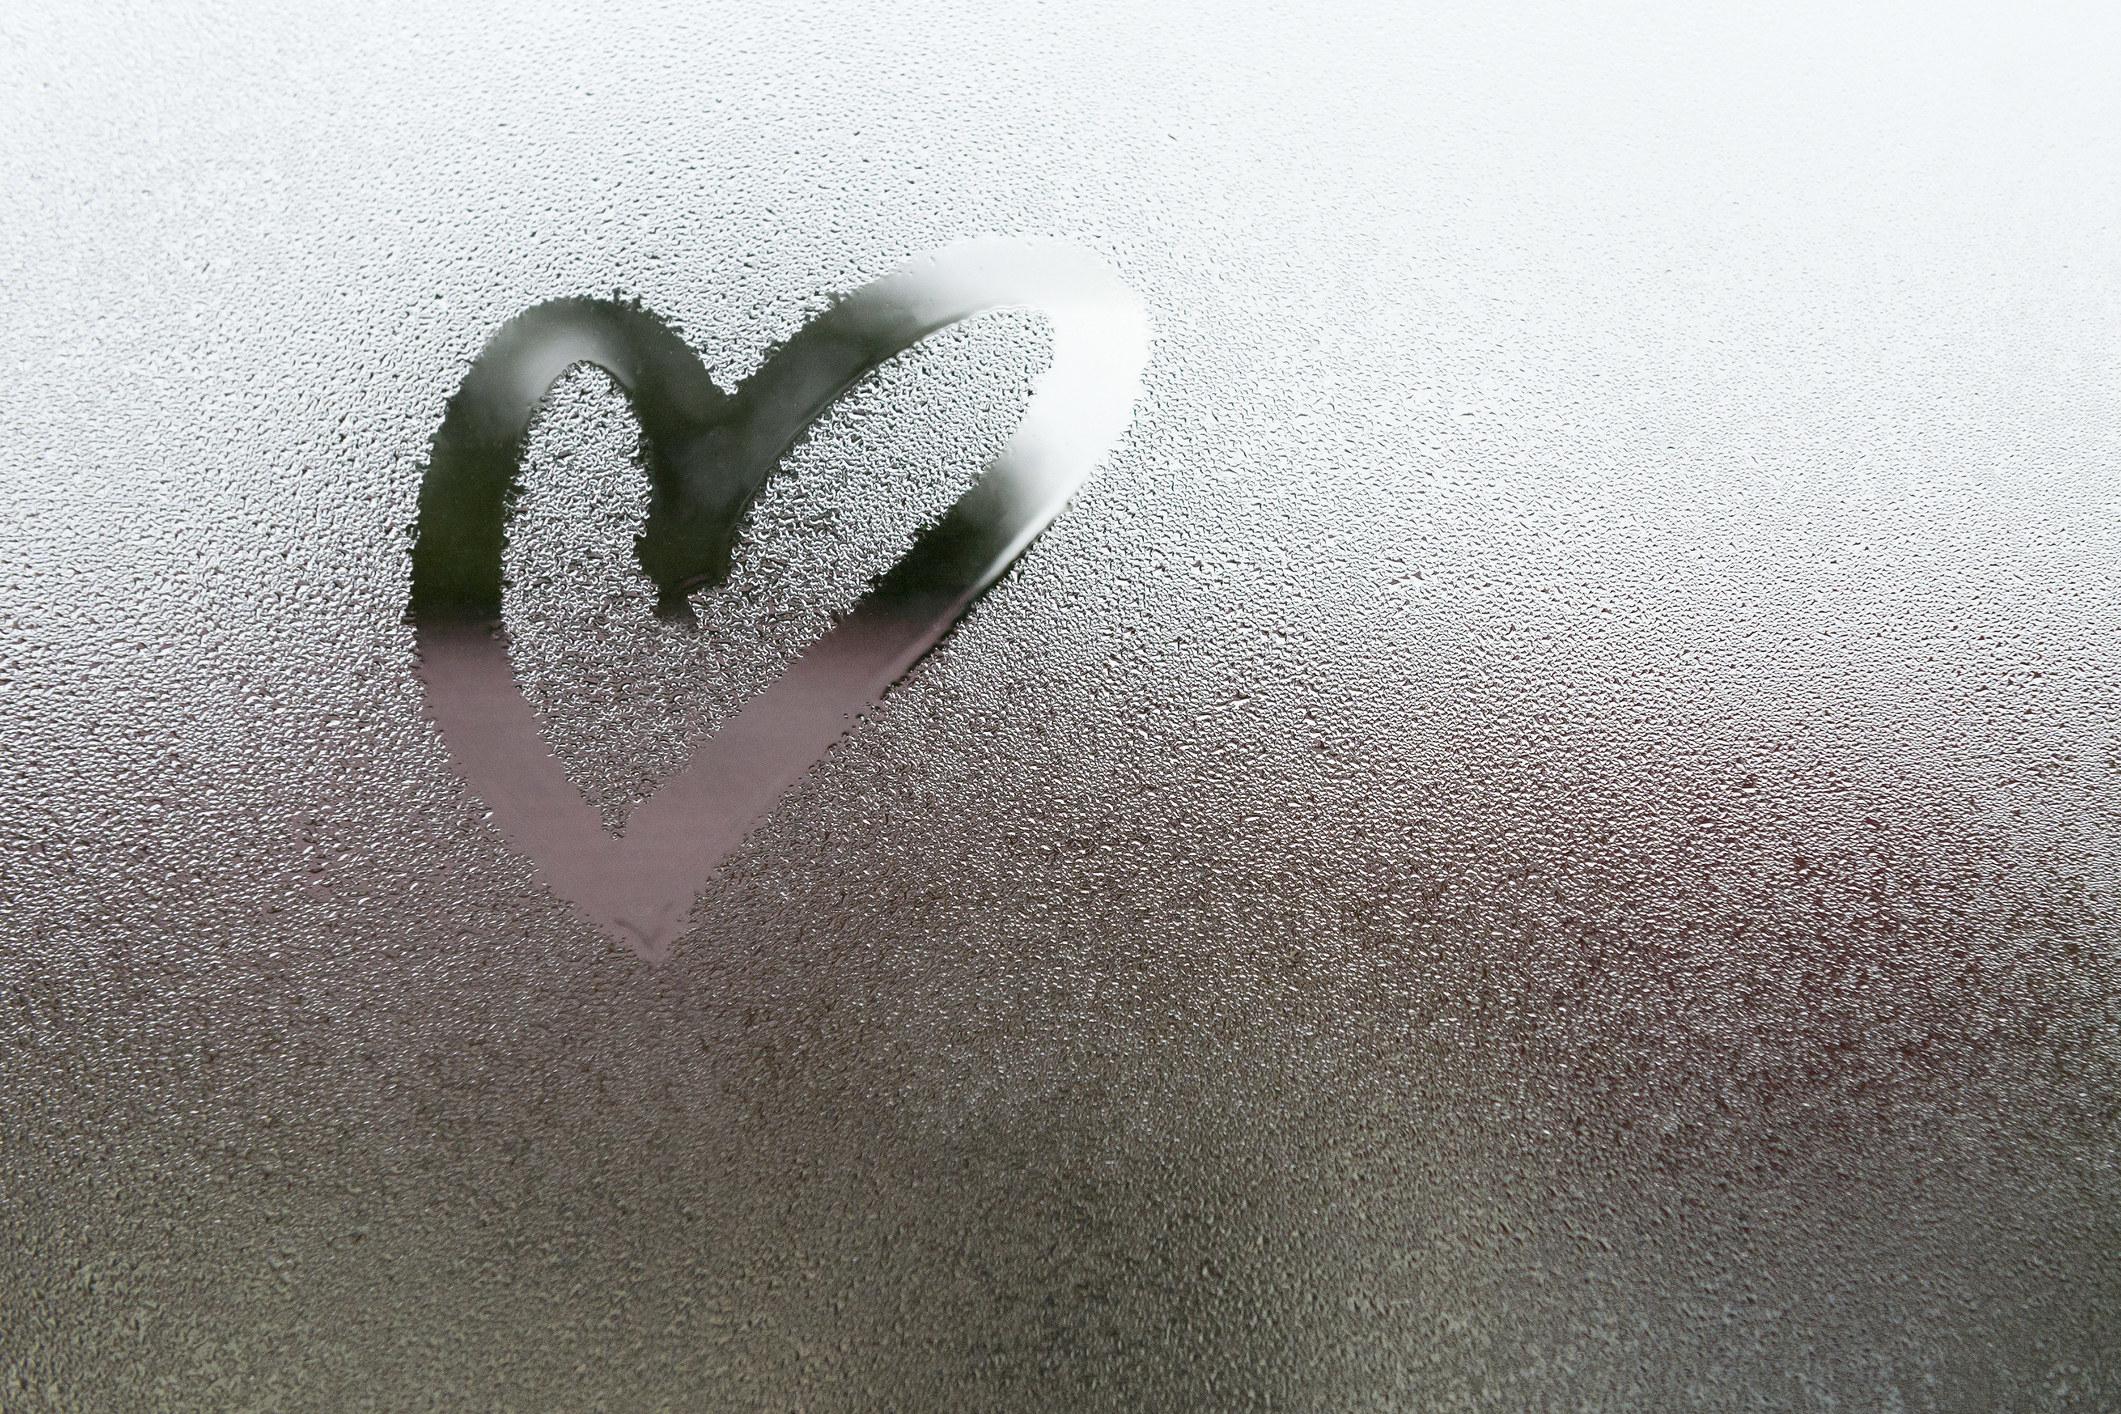 A heart drawn on breathe on a window